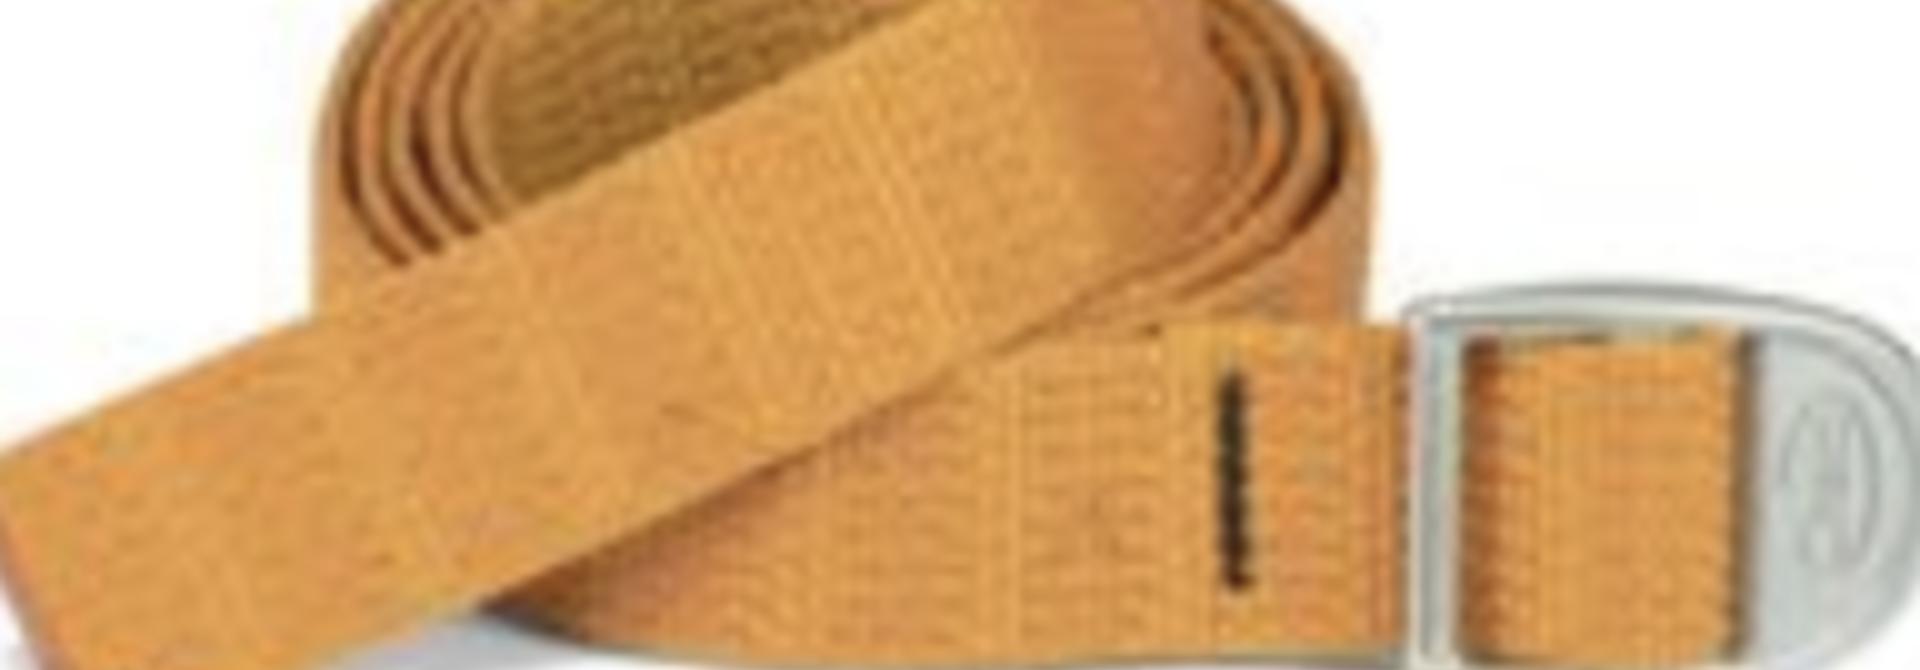 "Chaco 1"" Belt"